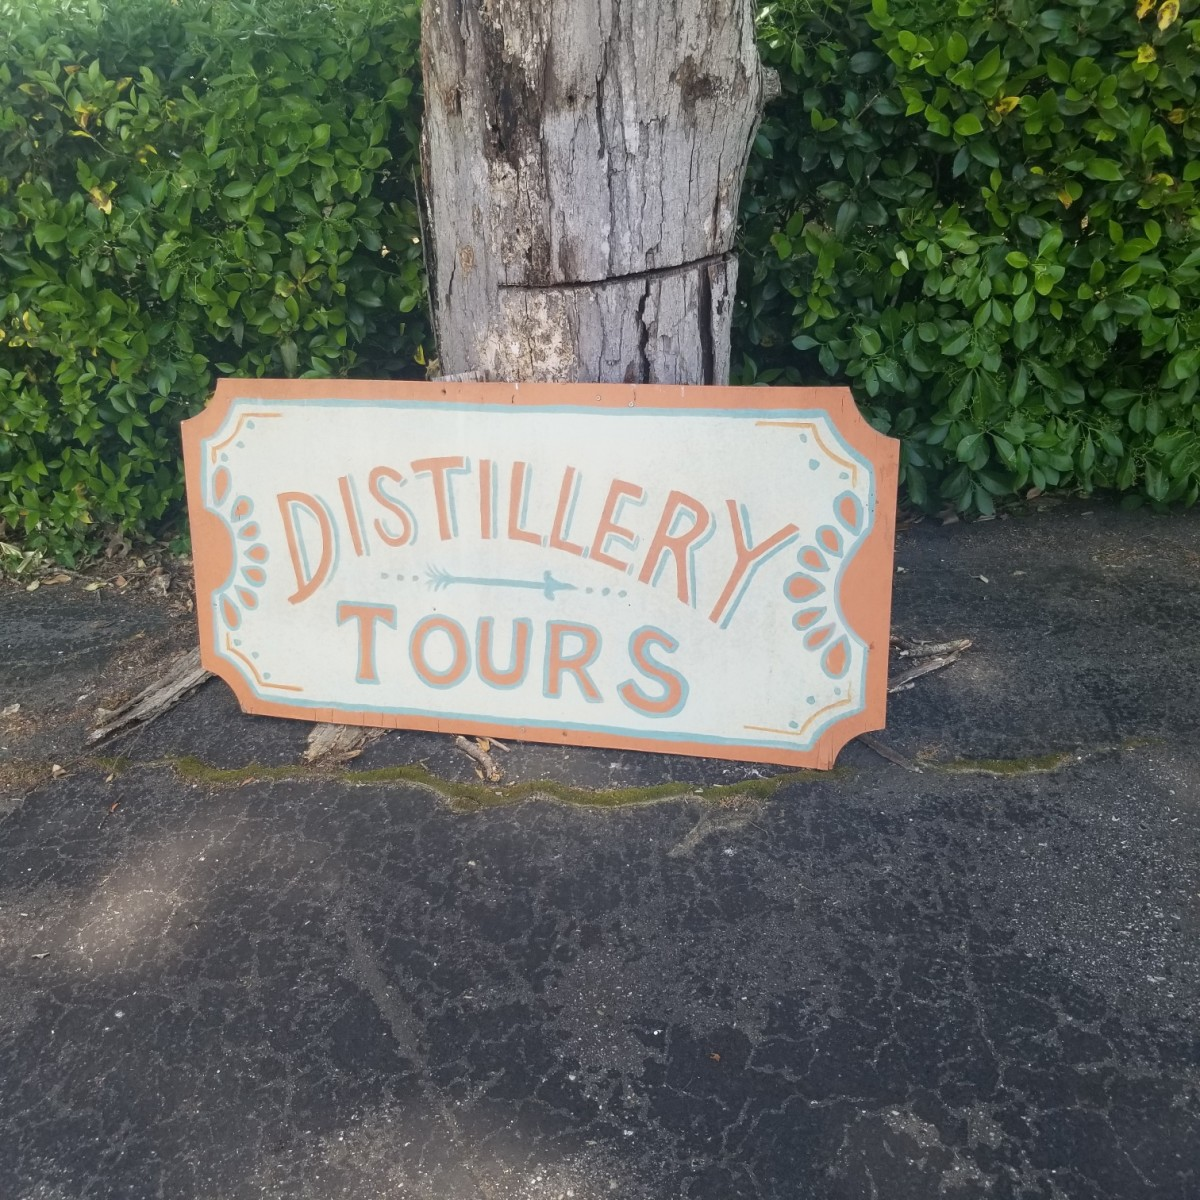 Enjoy a distillery tour at CopperFox Distillery.